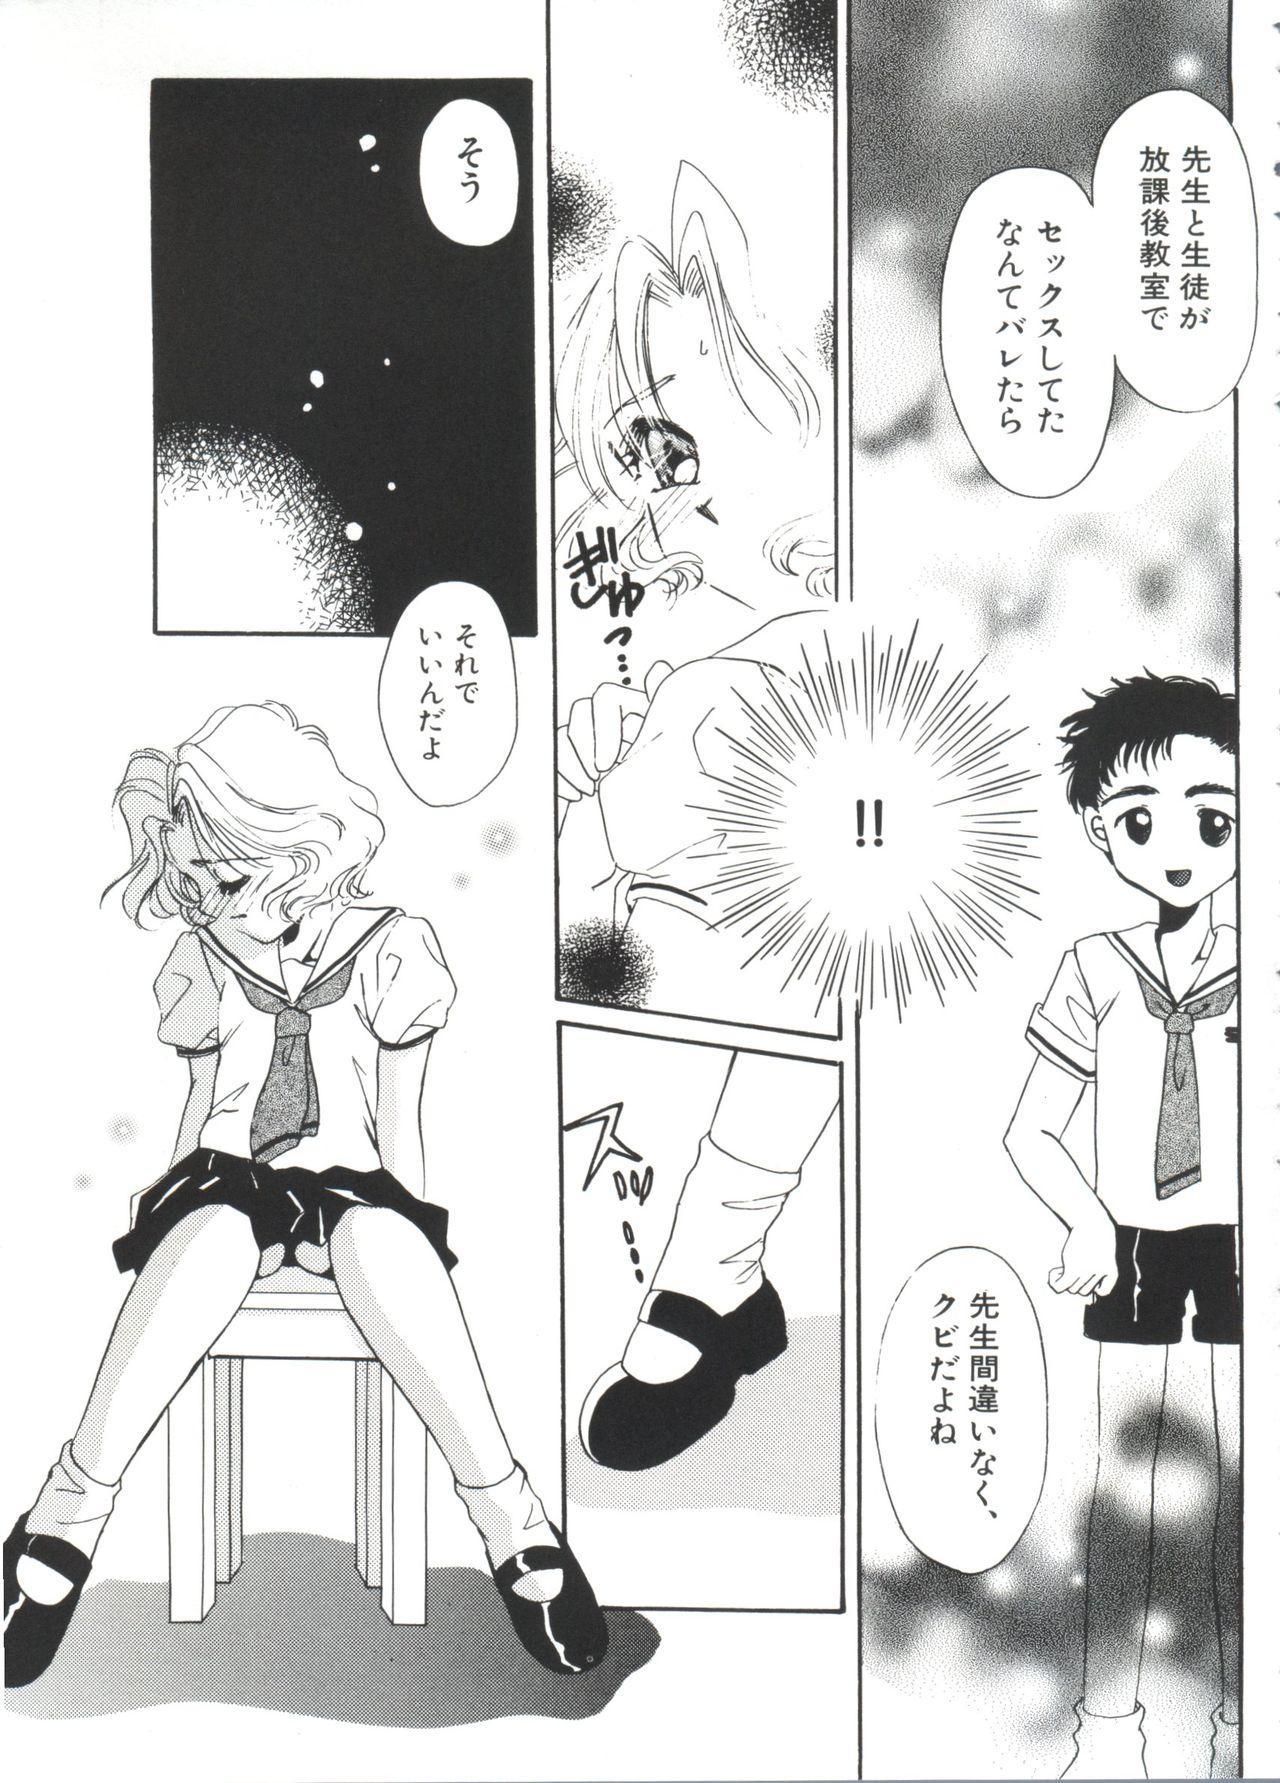 Ero-chan to Issho 2 118